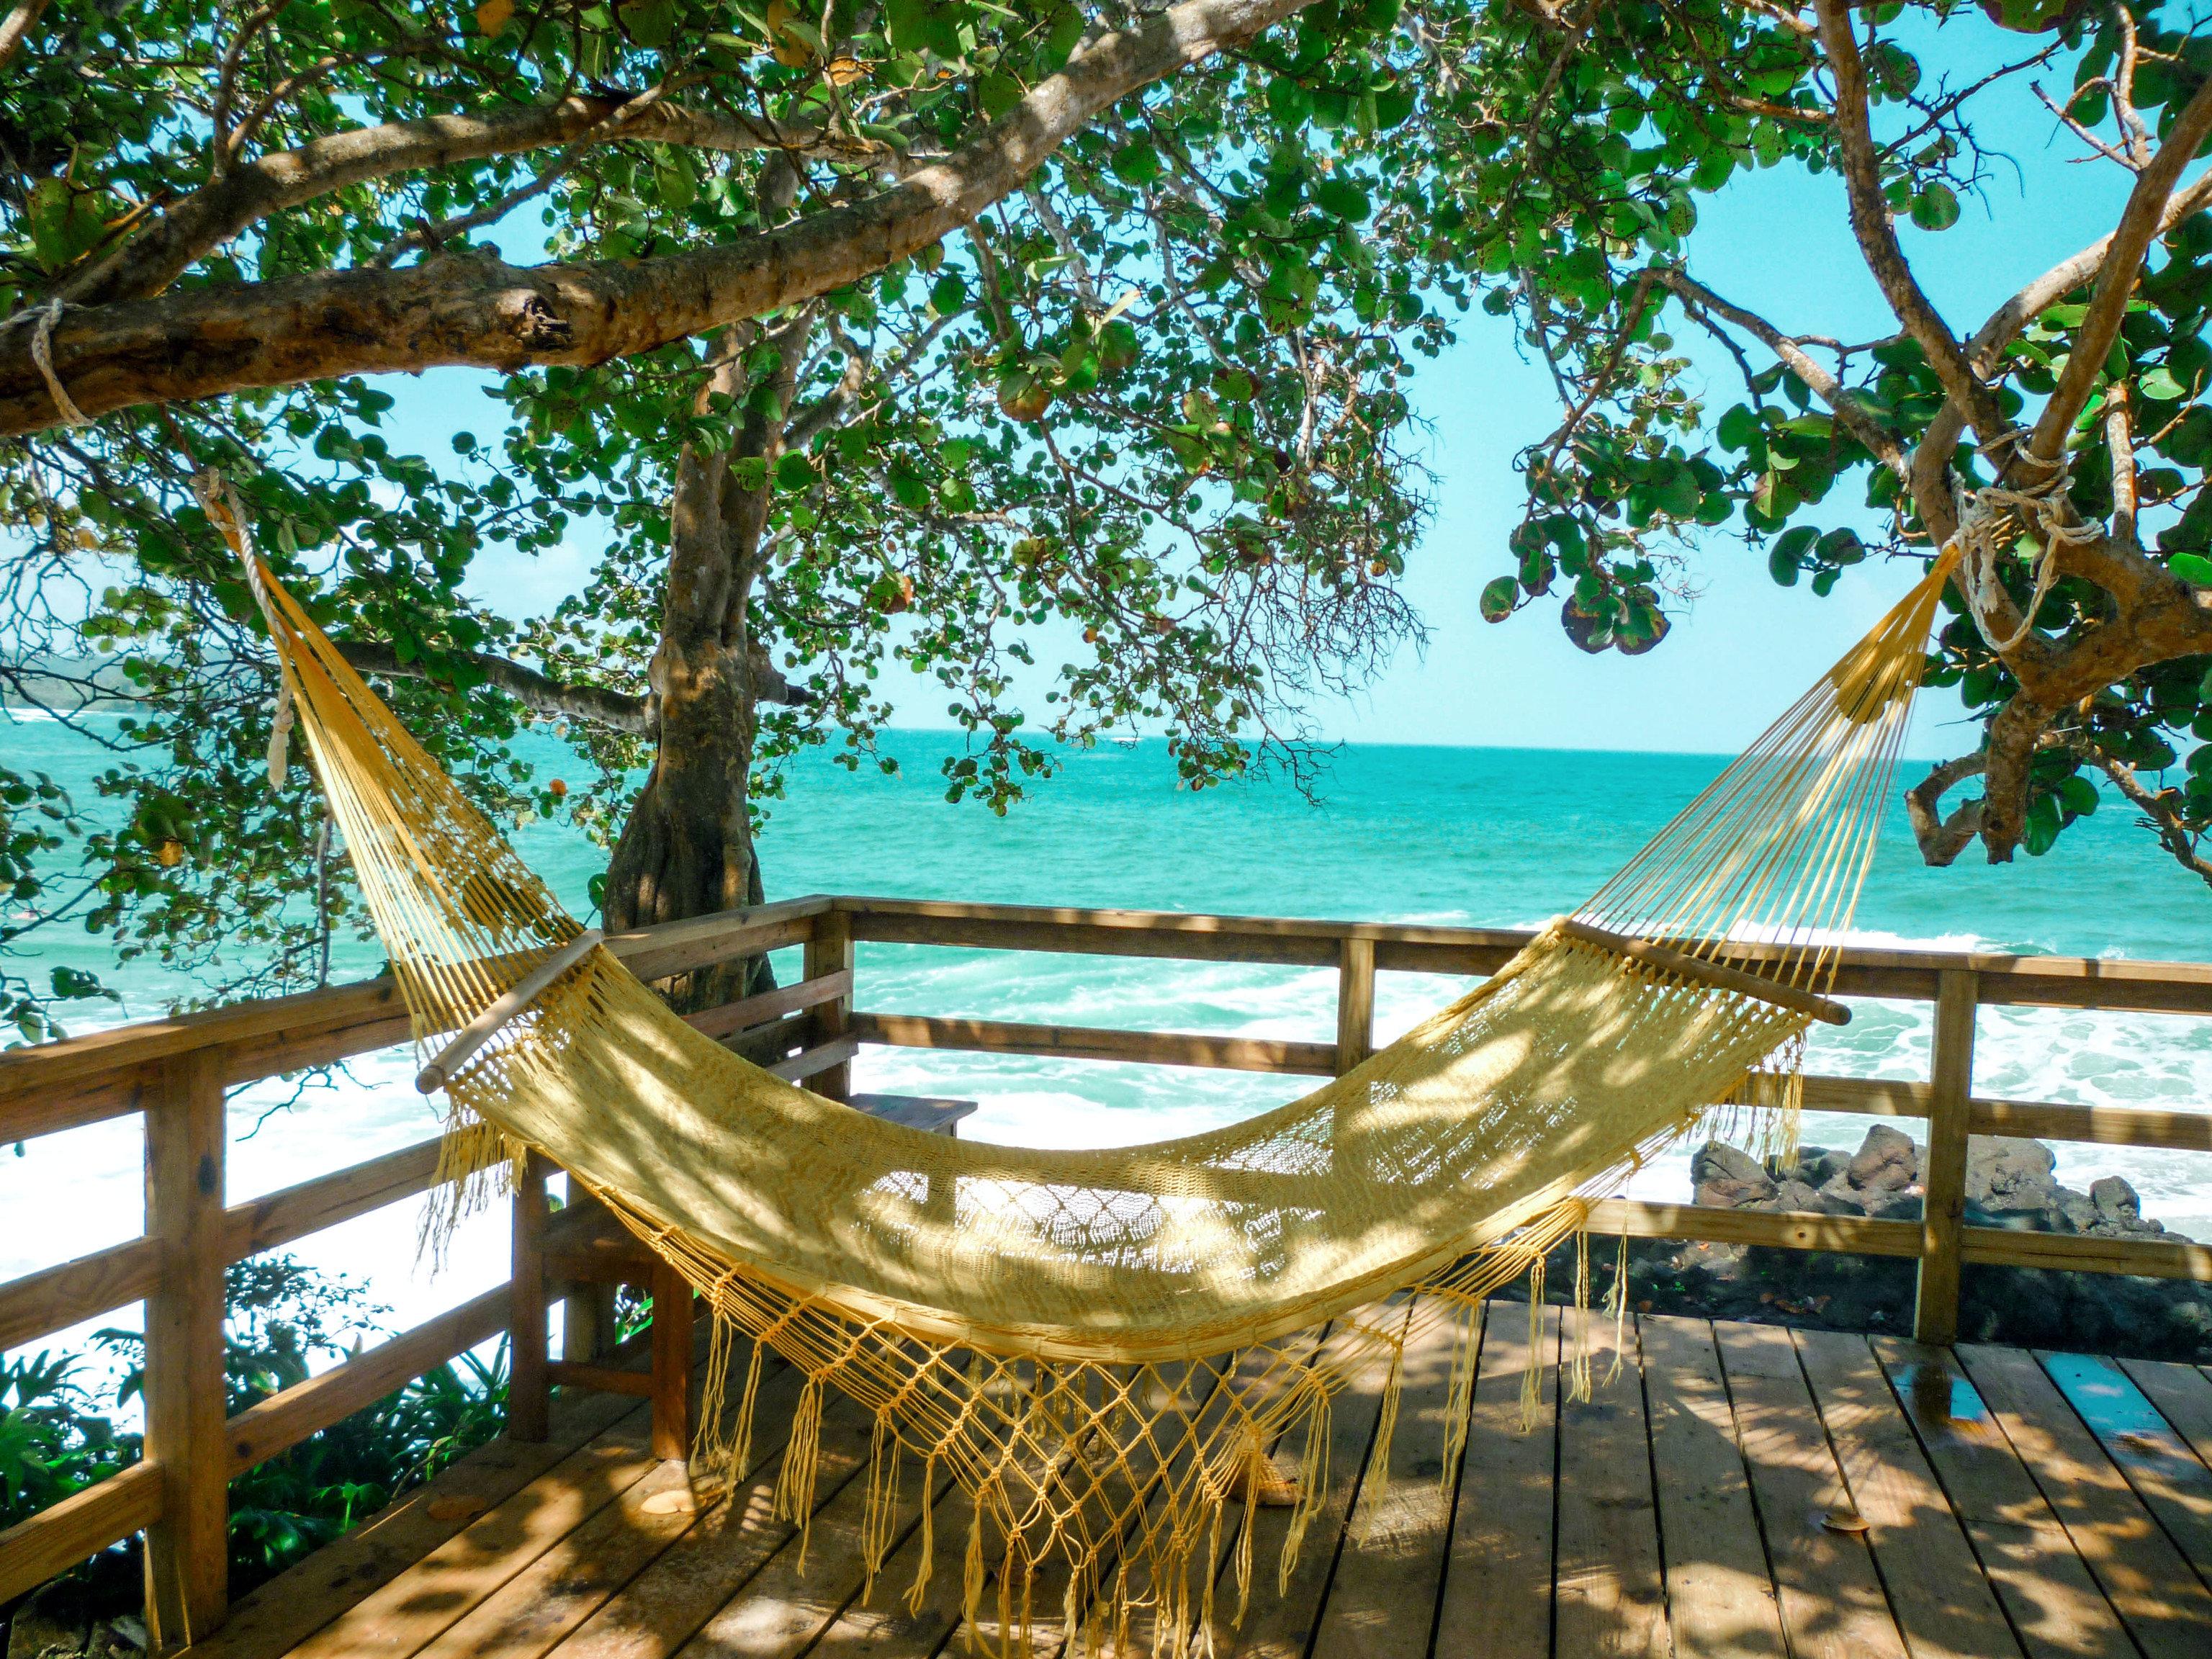 tree leisure swimming pool hammock Resort caribbean Villa Water park tropics overlooking lined